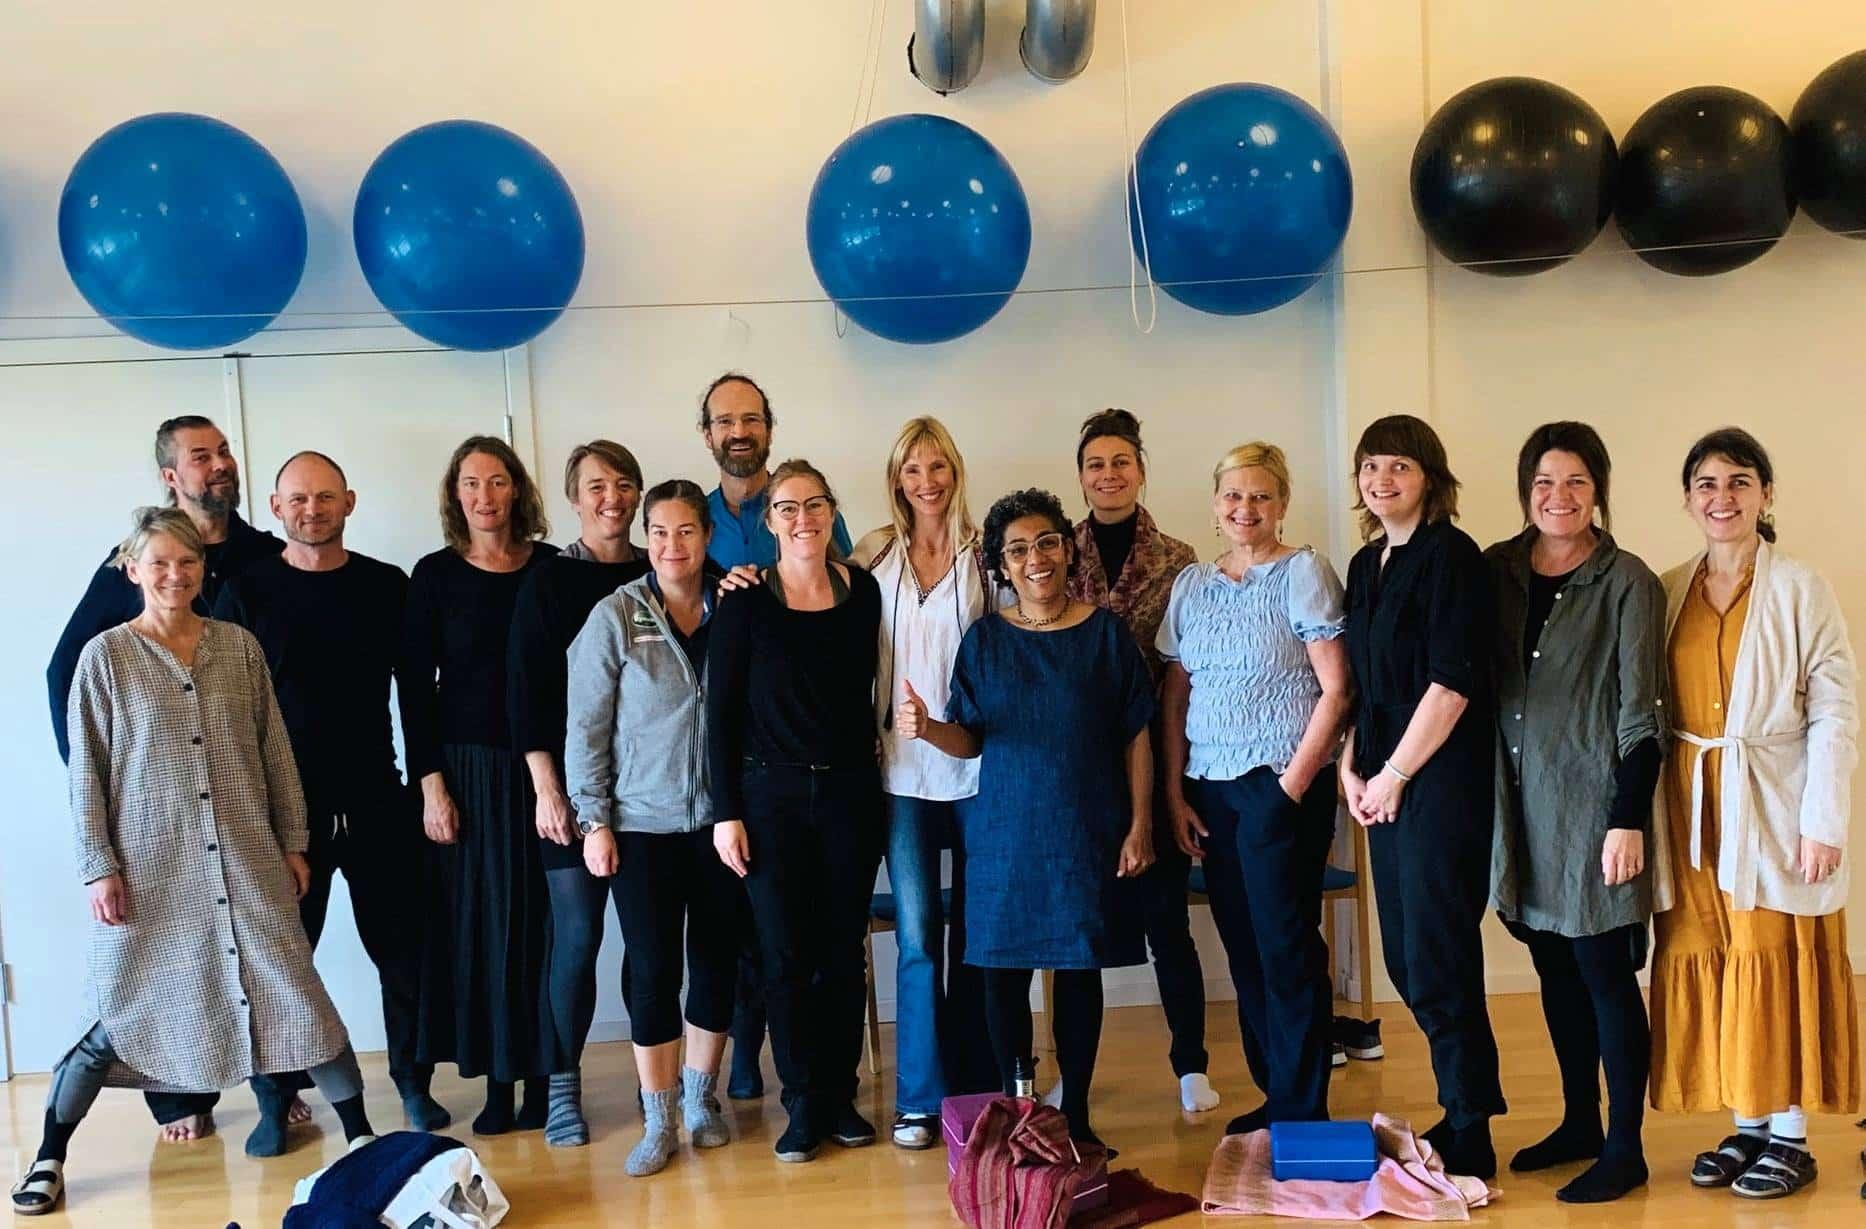 Angelica Massage Aarhus - Traumer og chok behandling